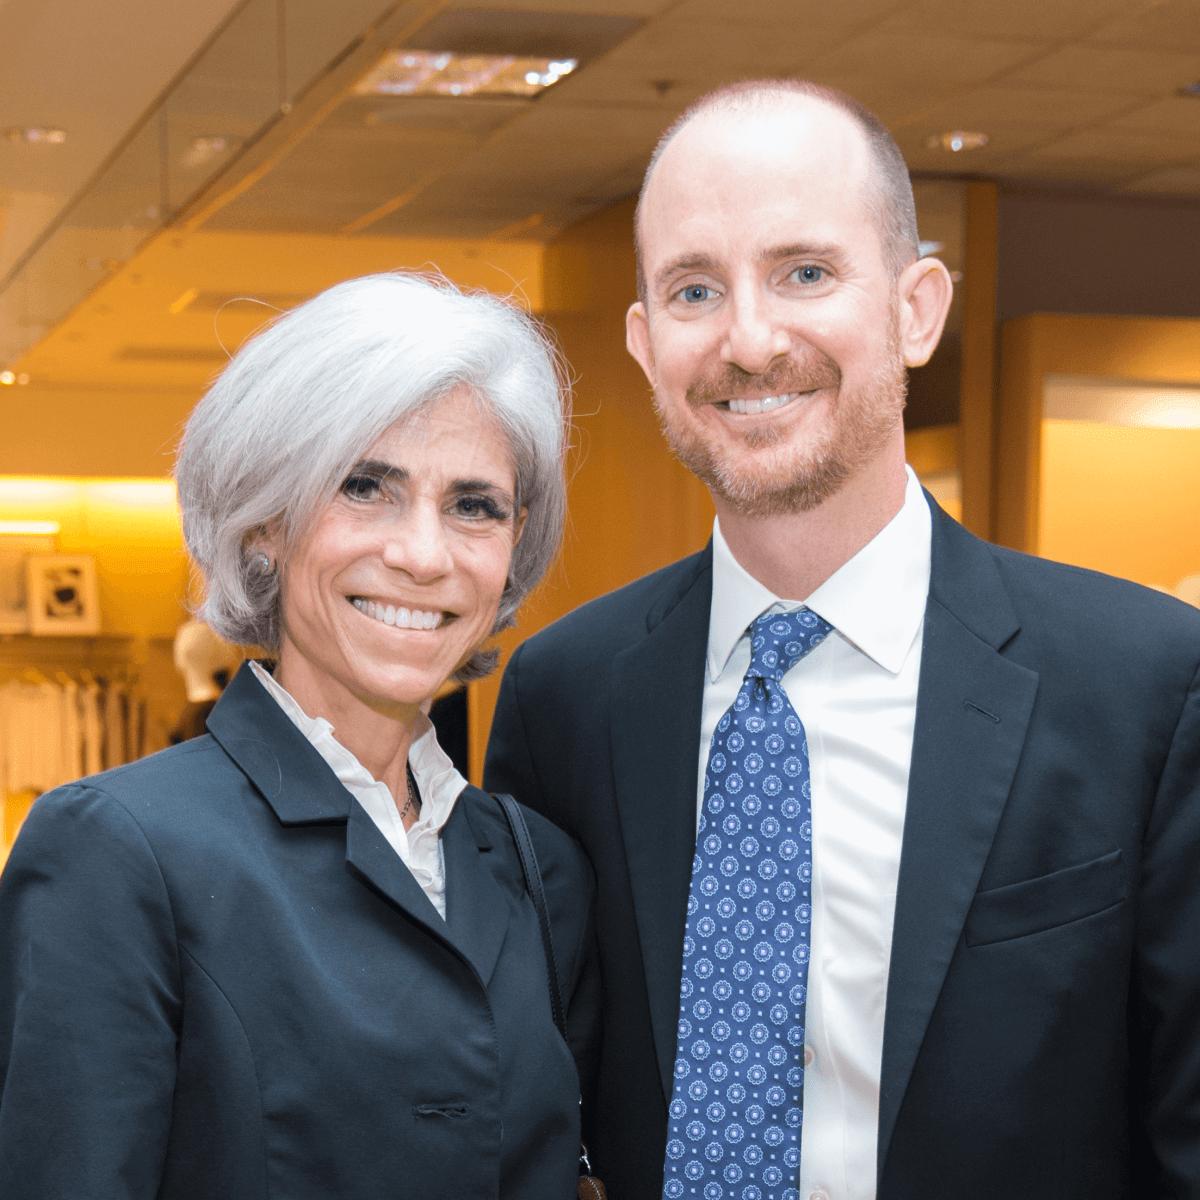 Mercury luncheon, 9/16, Judy Nyquist, Brian Ritter